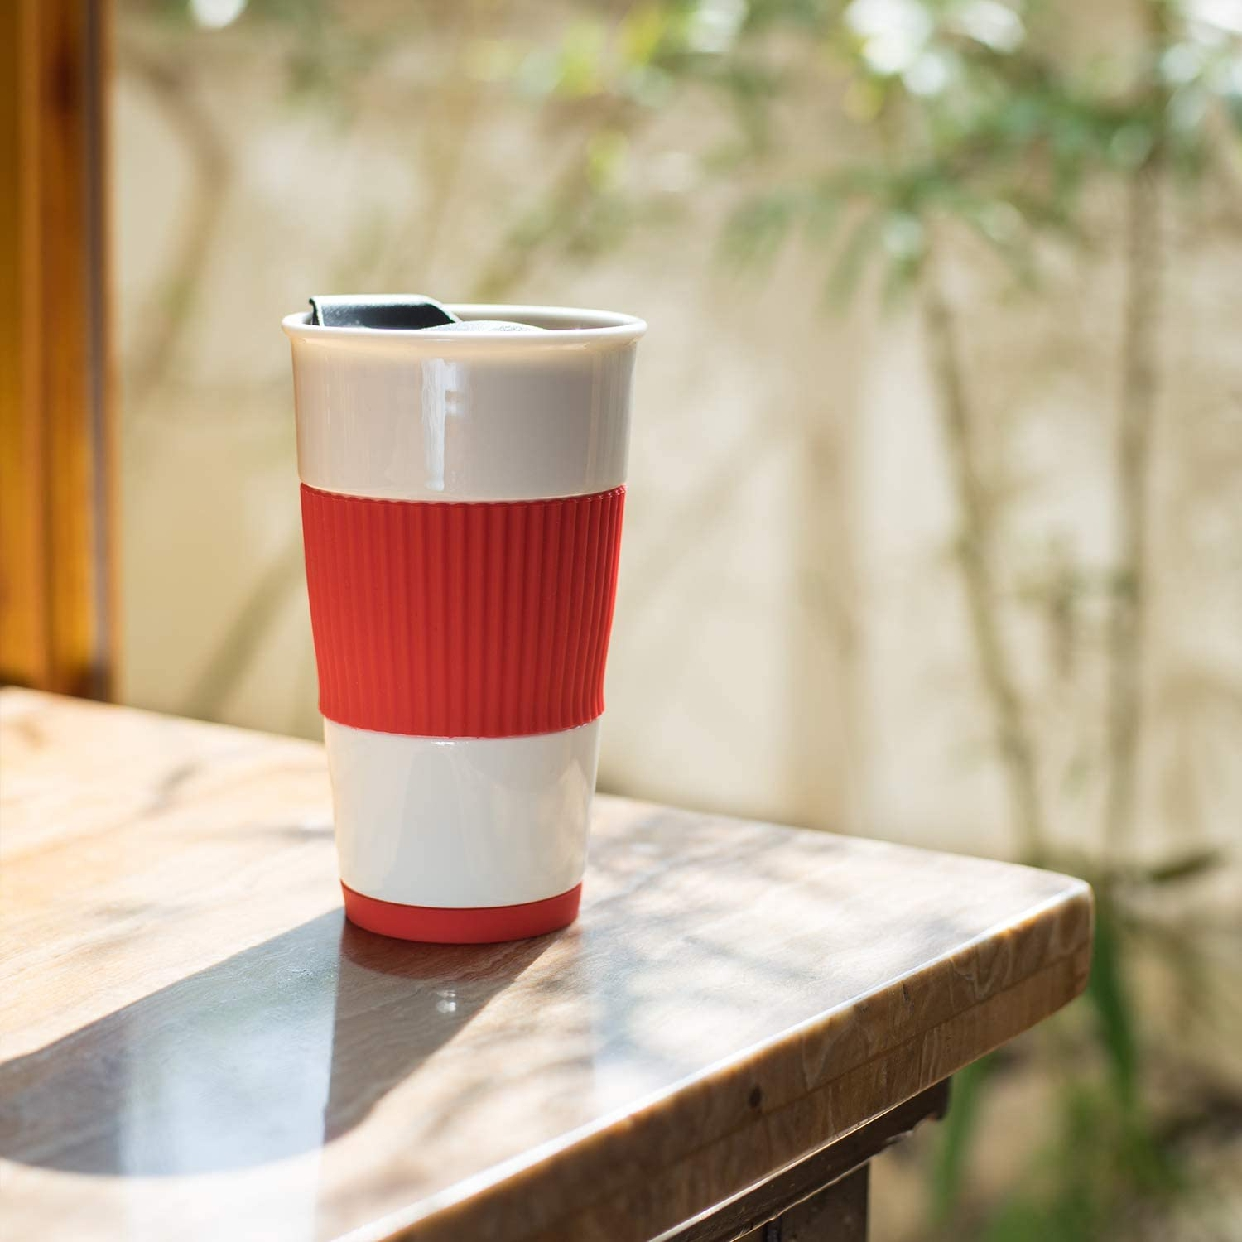 UDMG(ユーディーエムジー) 二重構造断熱コーヒーカップの商品画像6